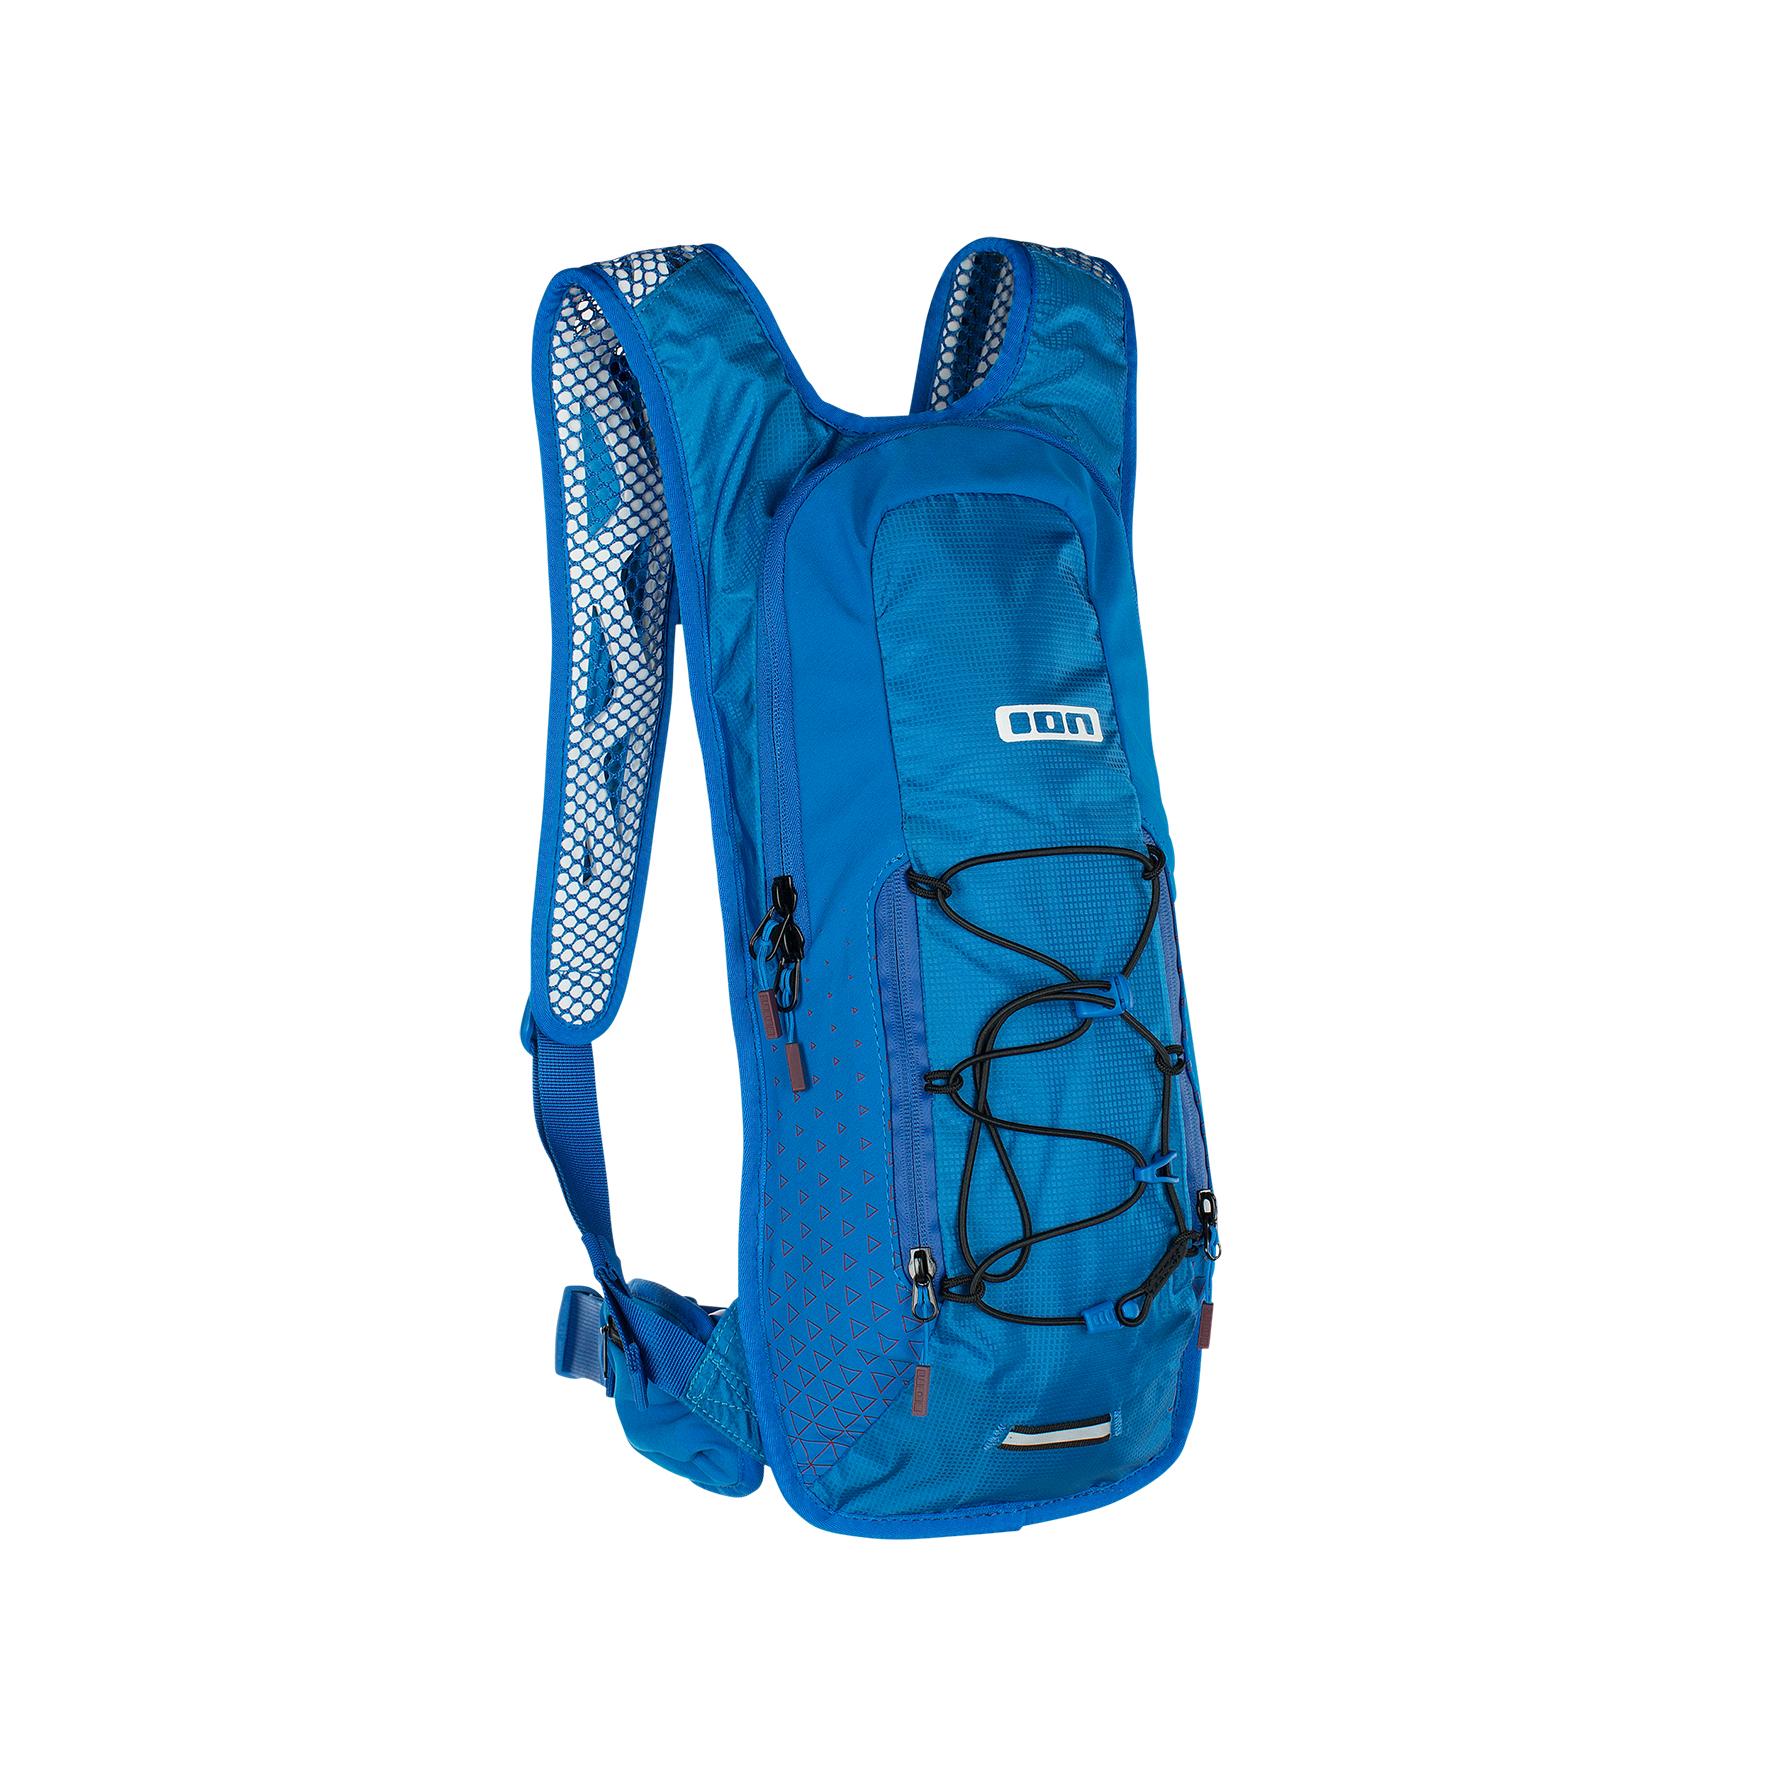 ION Backpack Villain (4 Liter), blau